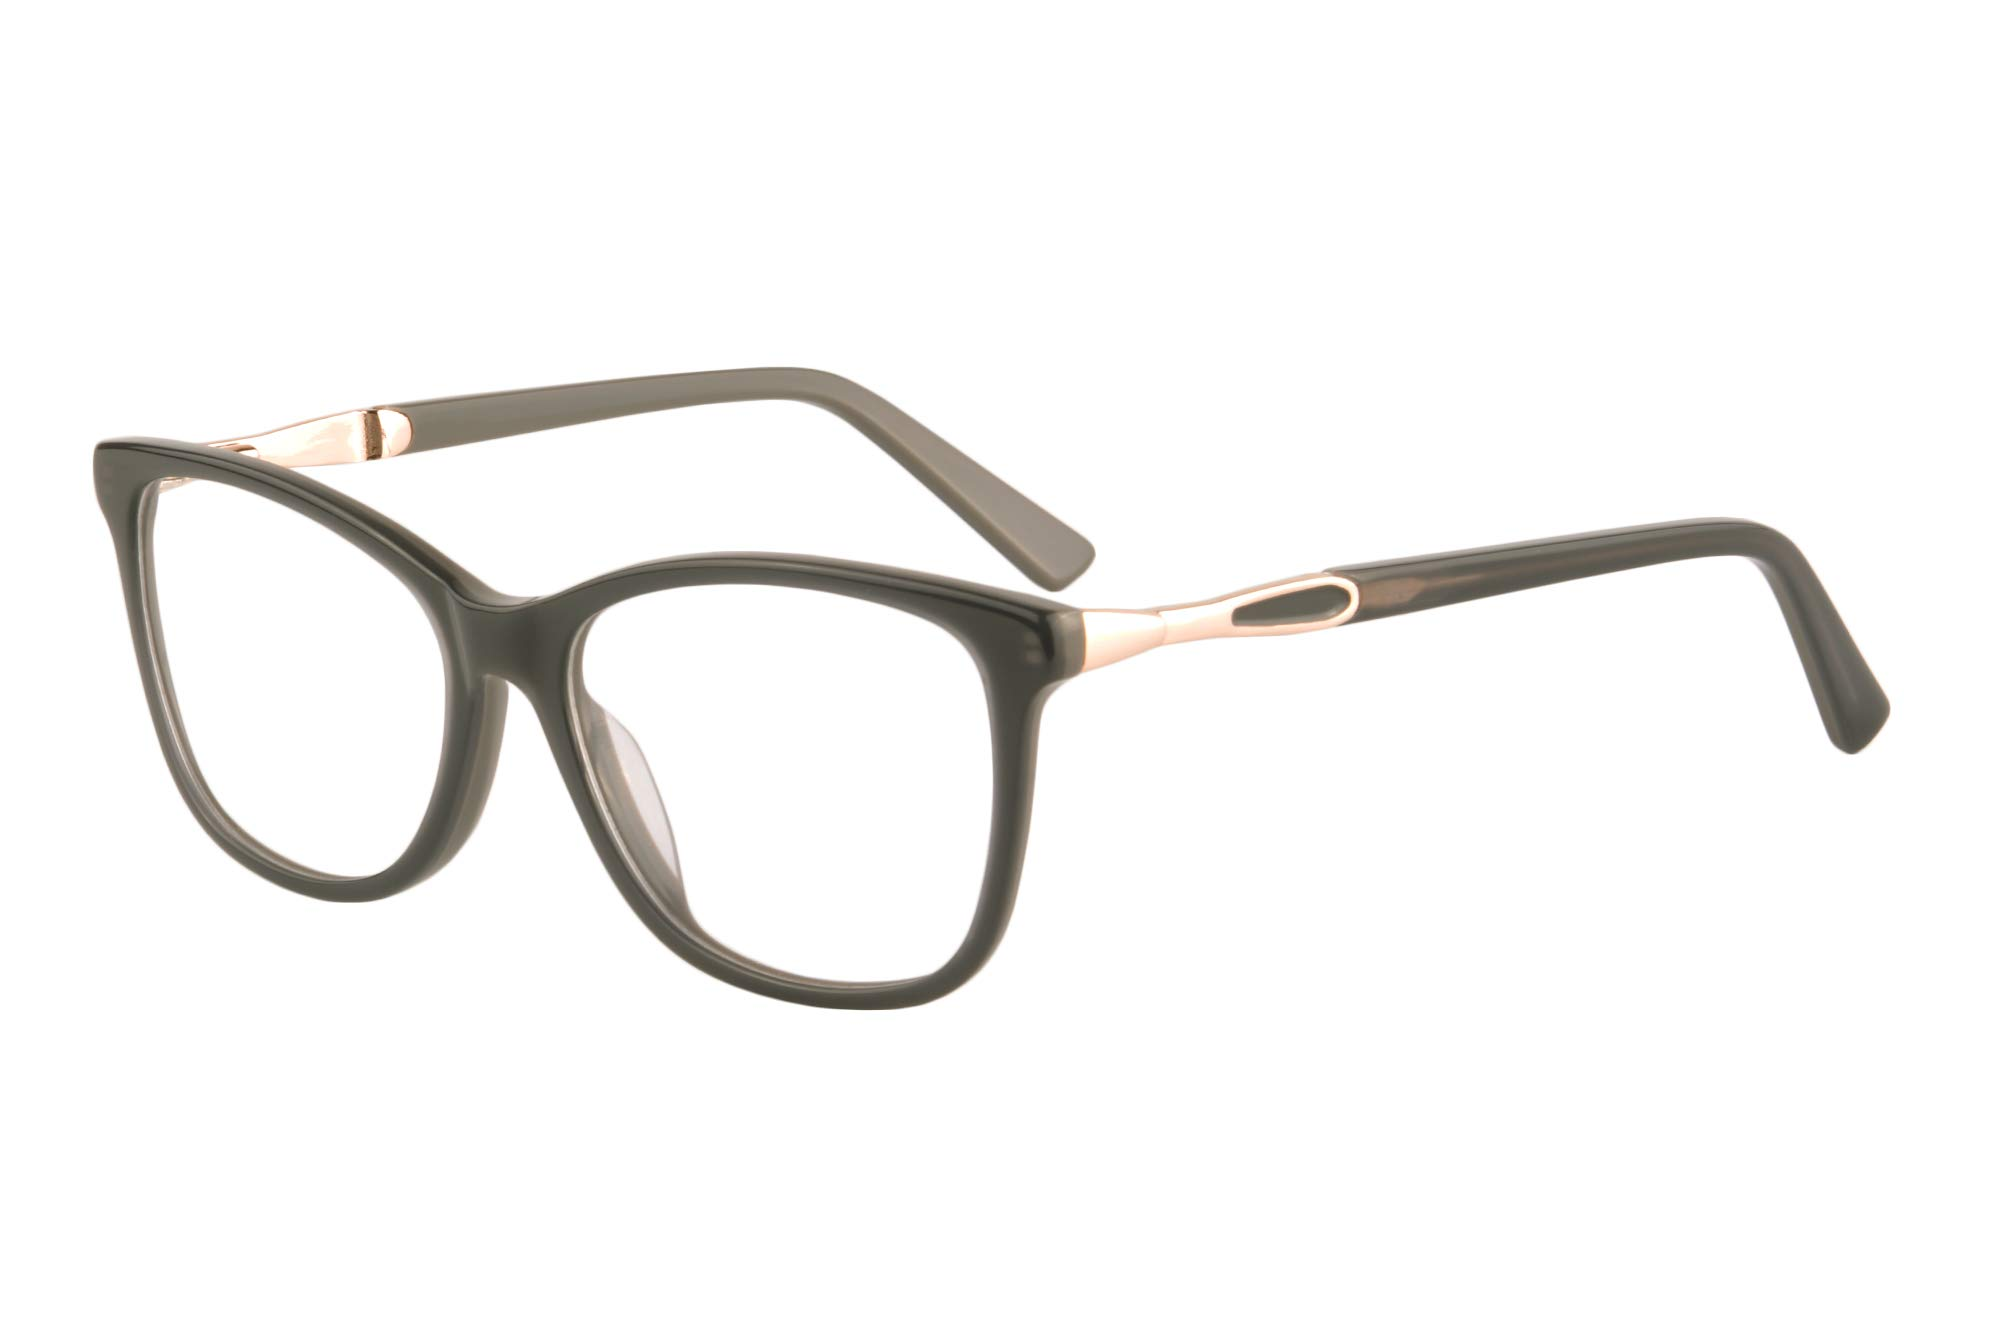 SHINU Acetate Cateye Frame Progressive Multifocus Anti Blue Light No Headach Reading Glasses-RD142(grey, anti-blue up 0 down 1.75)